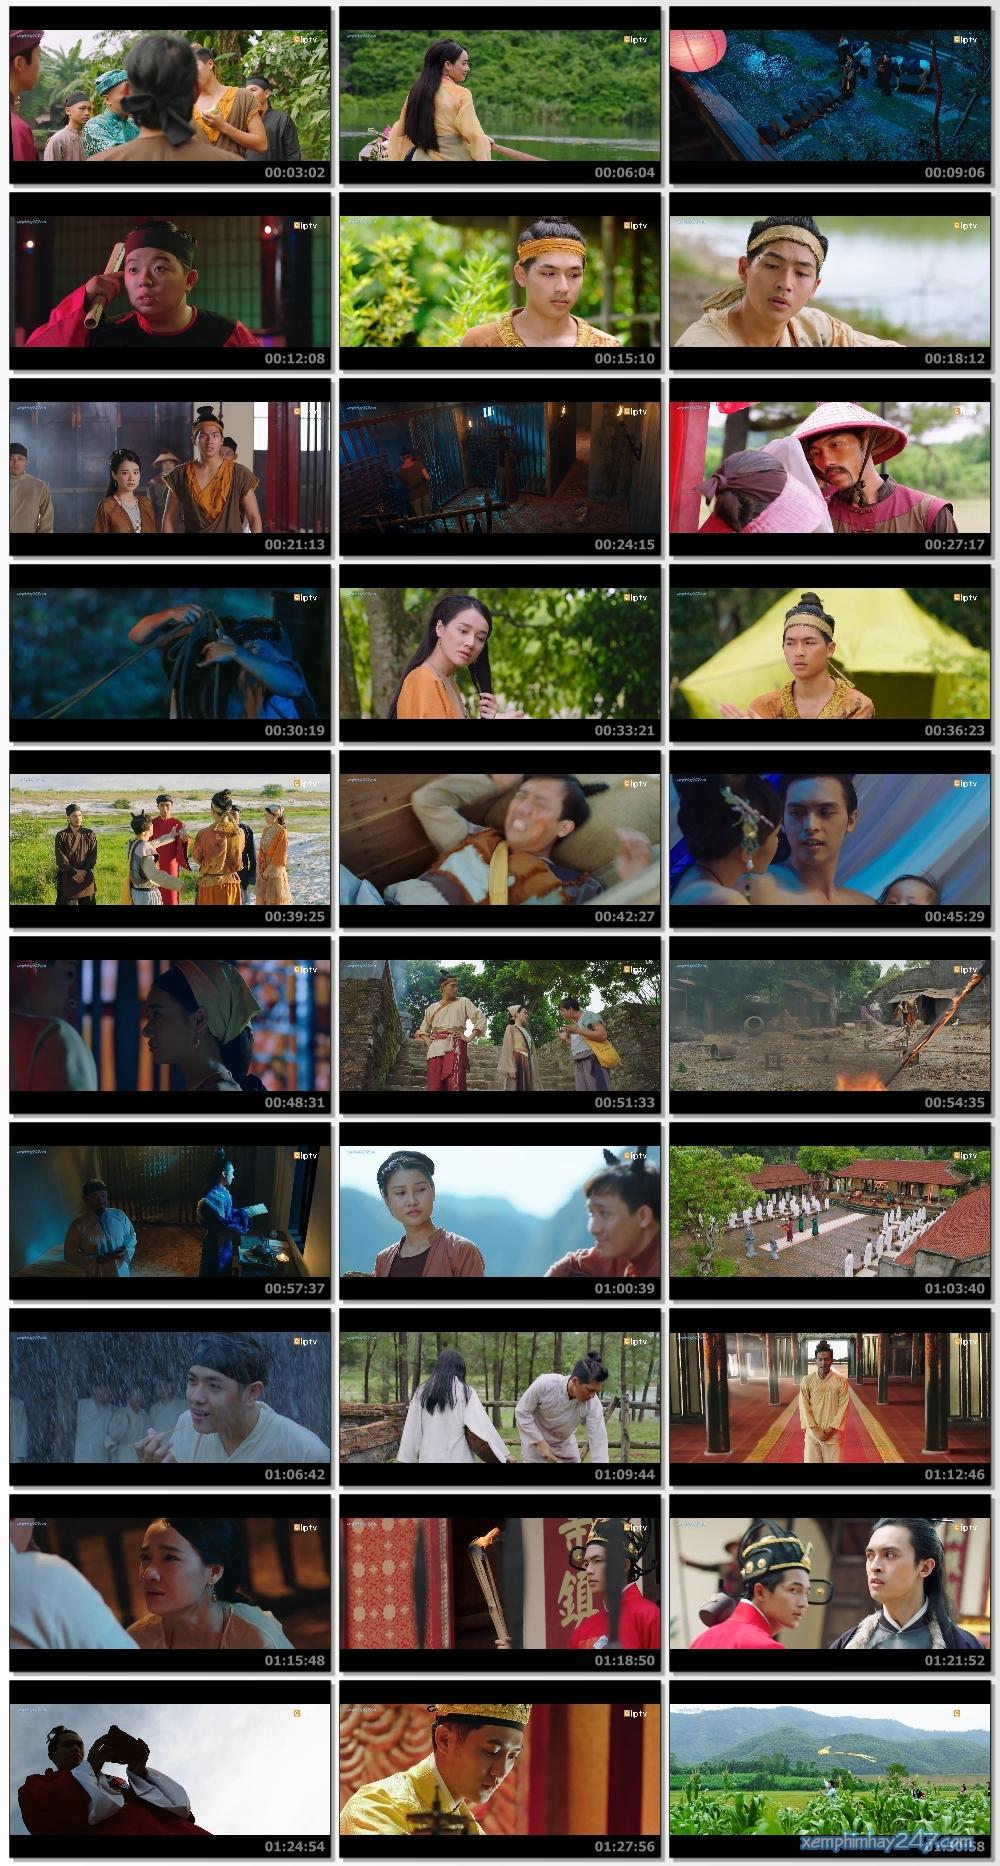 http://xemphimhay247.com - Xem phim hay 247 - Trạng Quỳnh (2019) - Trạng Quỳnh (2019)